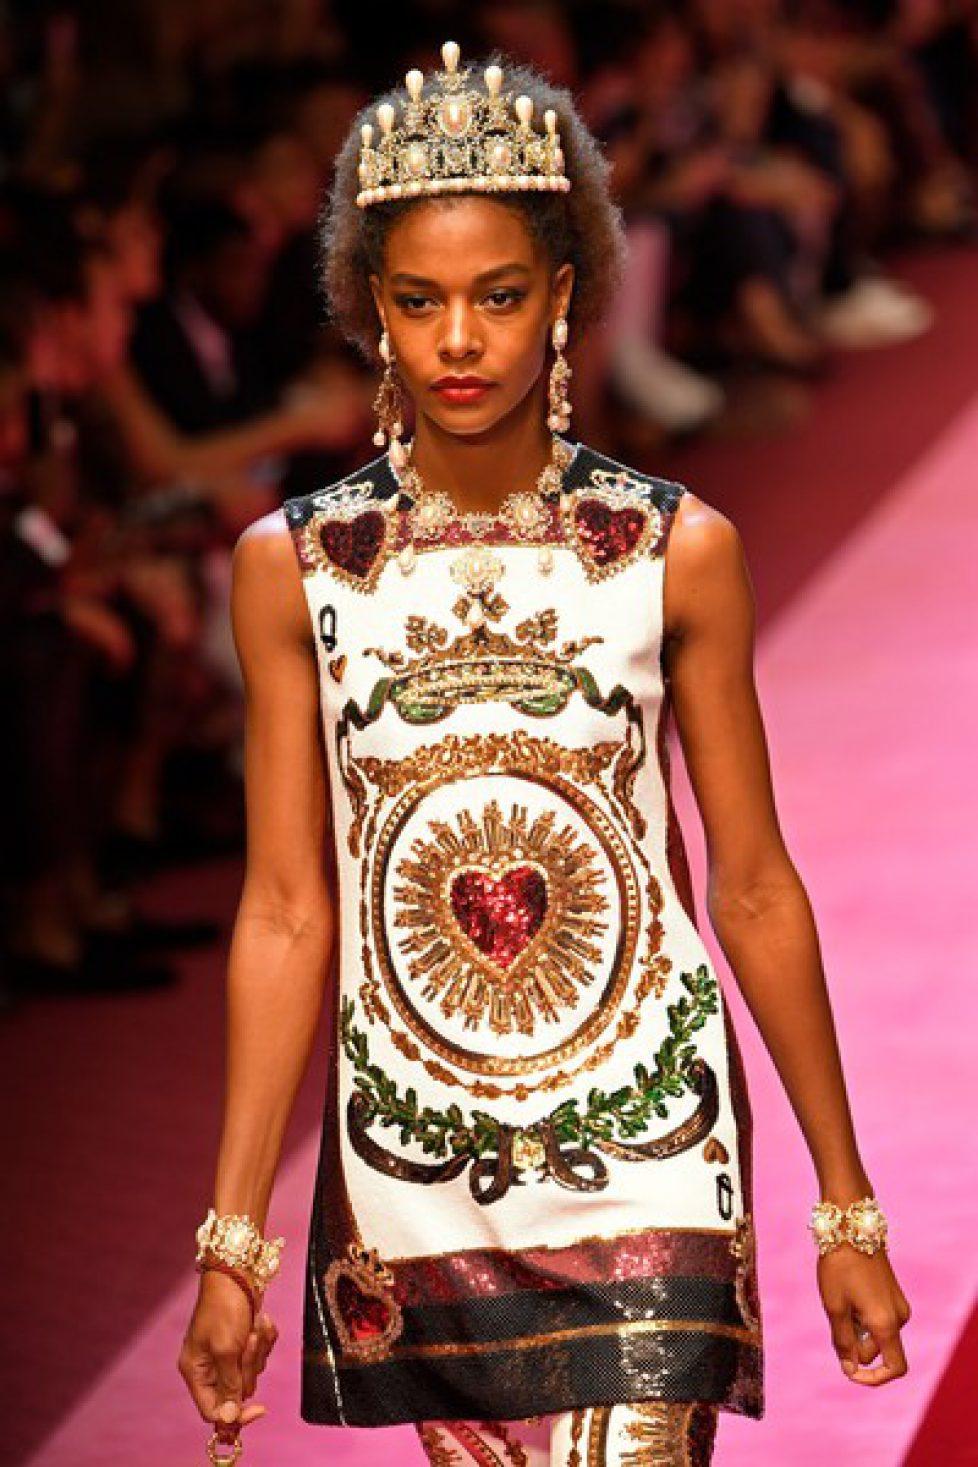 Dolce+Gabbana+Runway+Milan+Fashion+Week+Spring+xX5e_lowfLSl